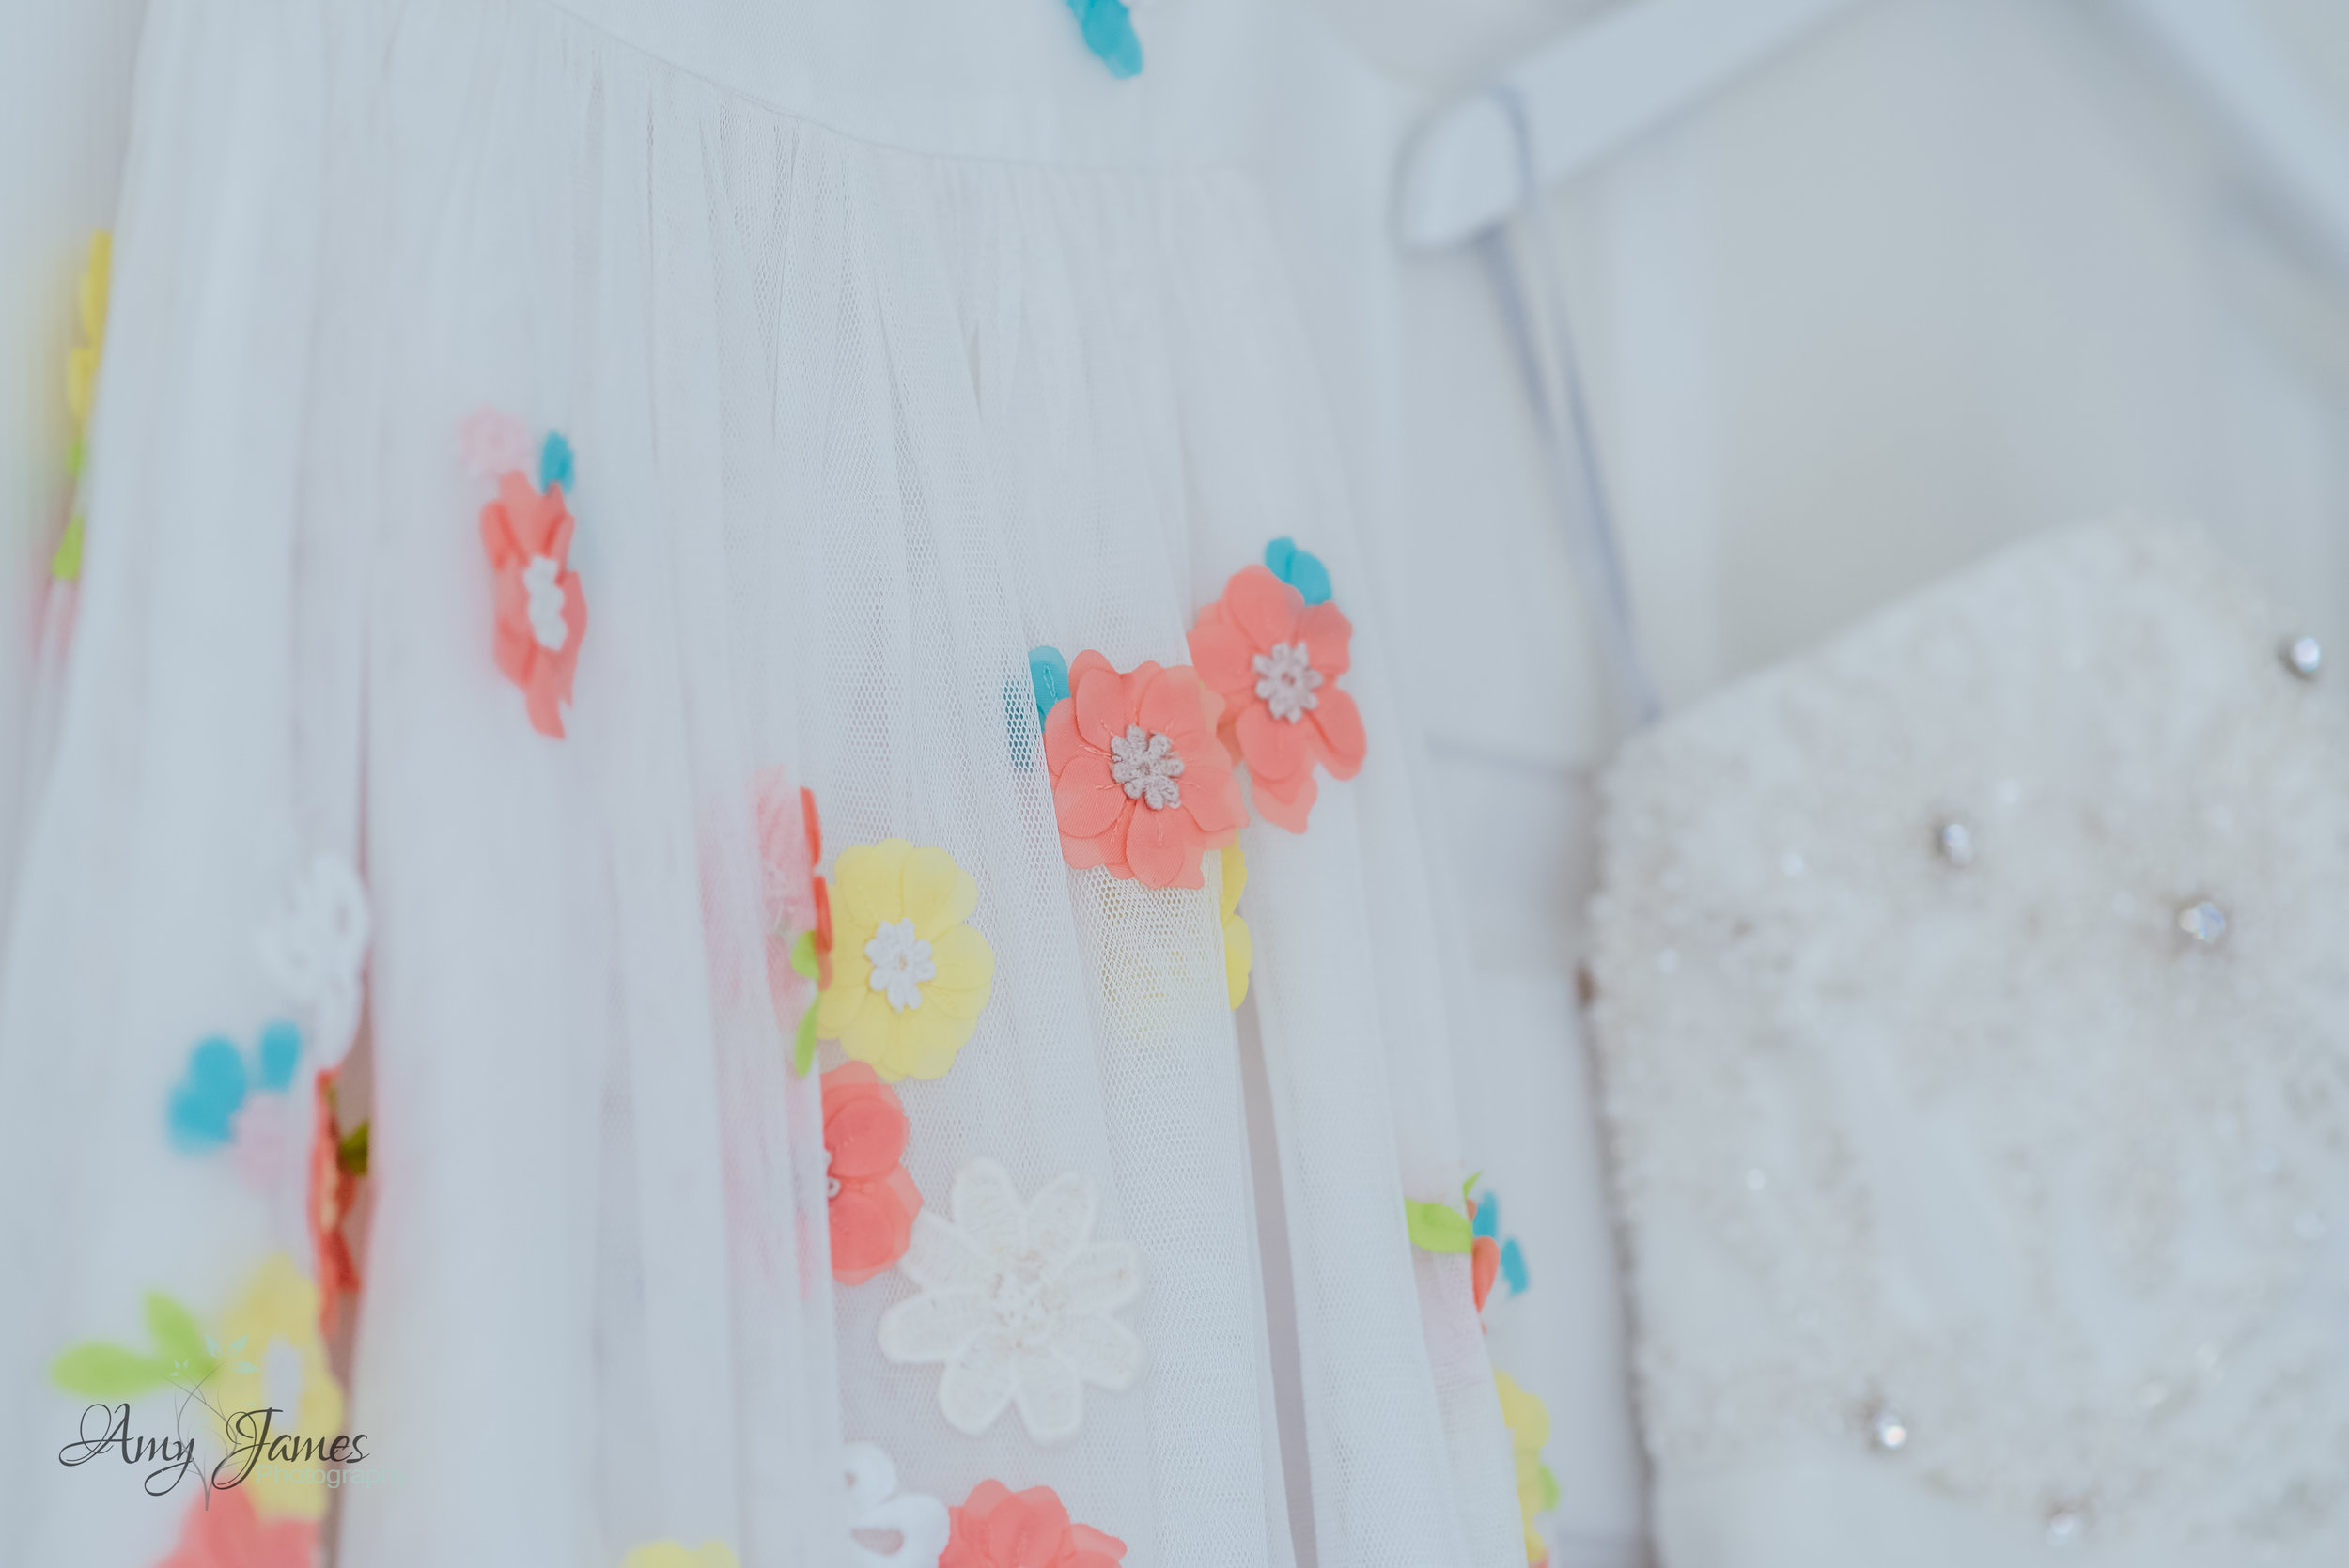 Pretty flower girl dress with orange flowers - Amy James Photography - Hampshire Wedding photographer - Fleet wedding photographer